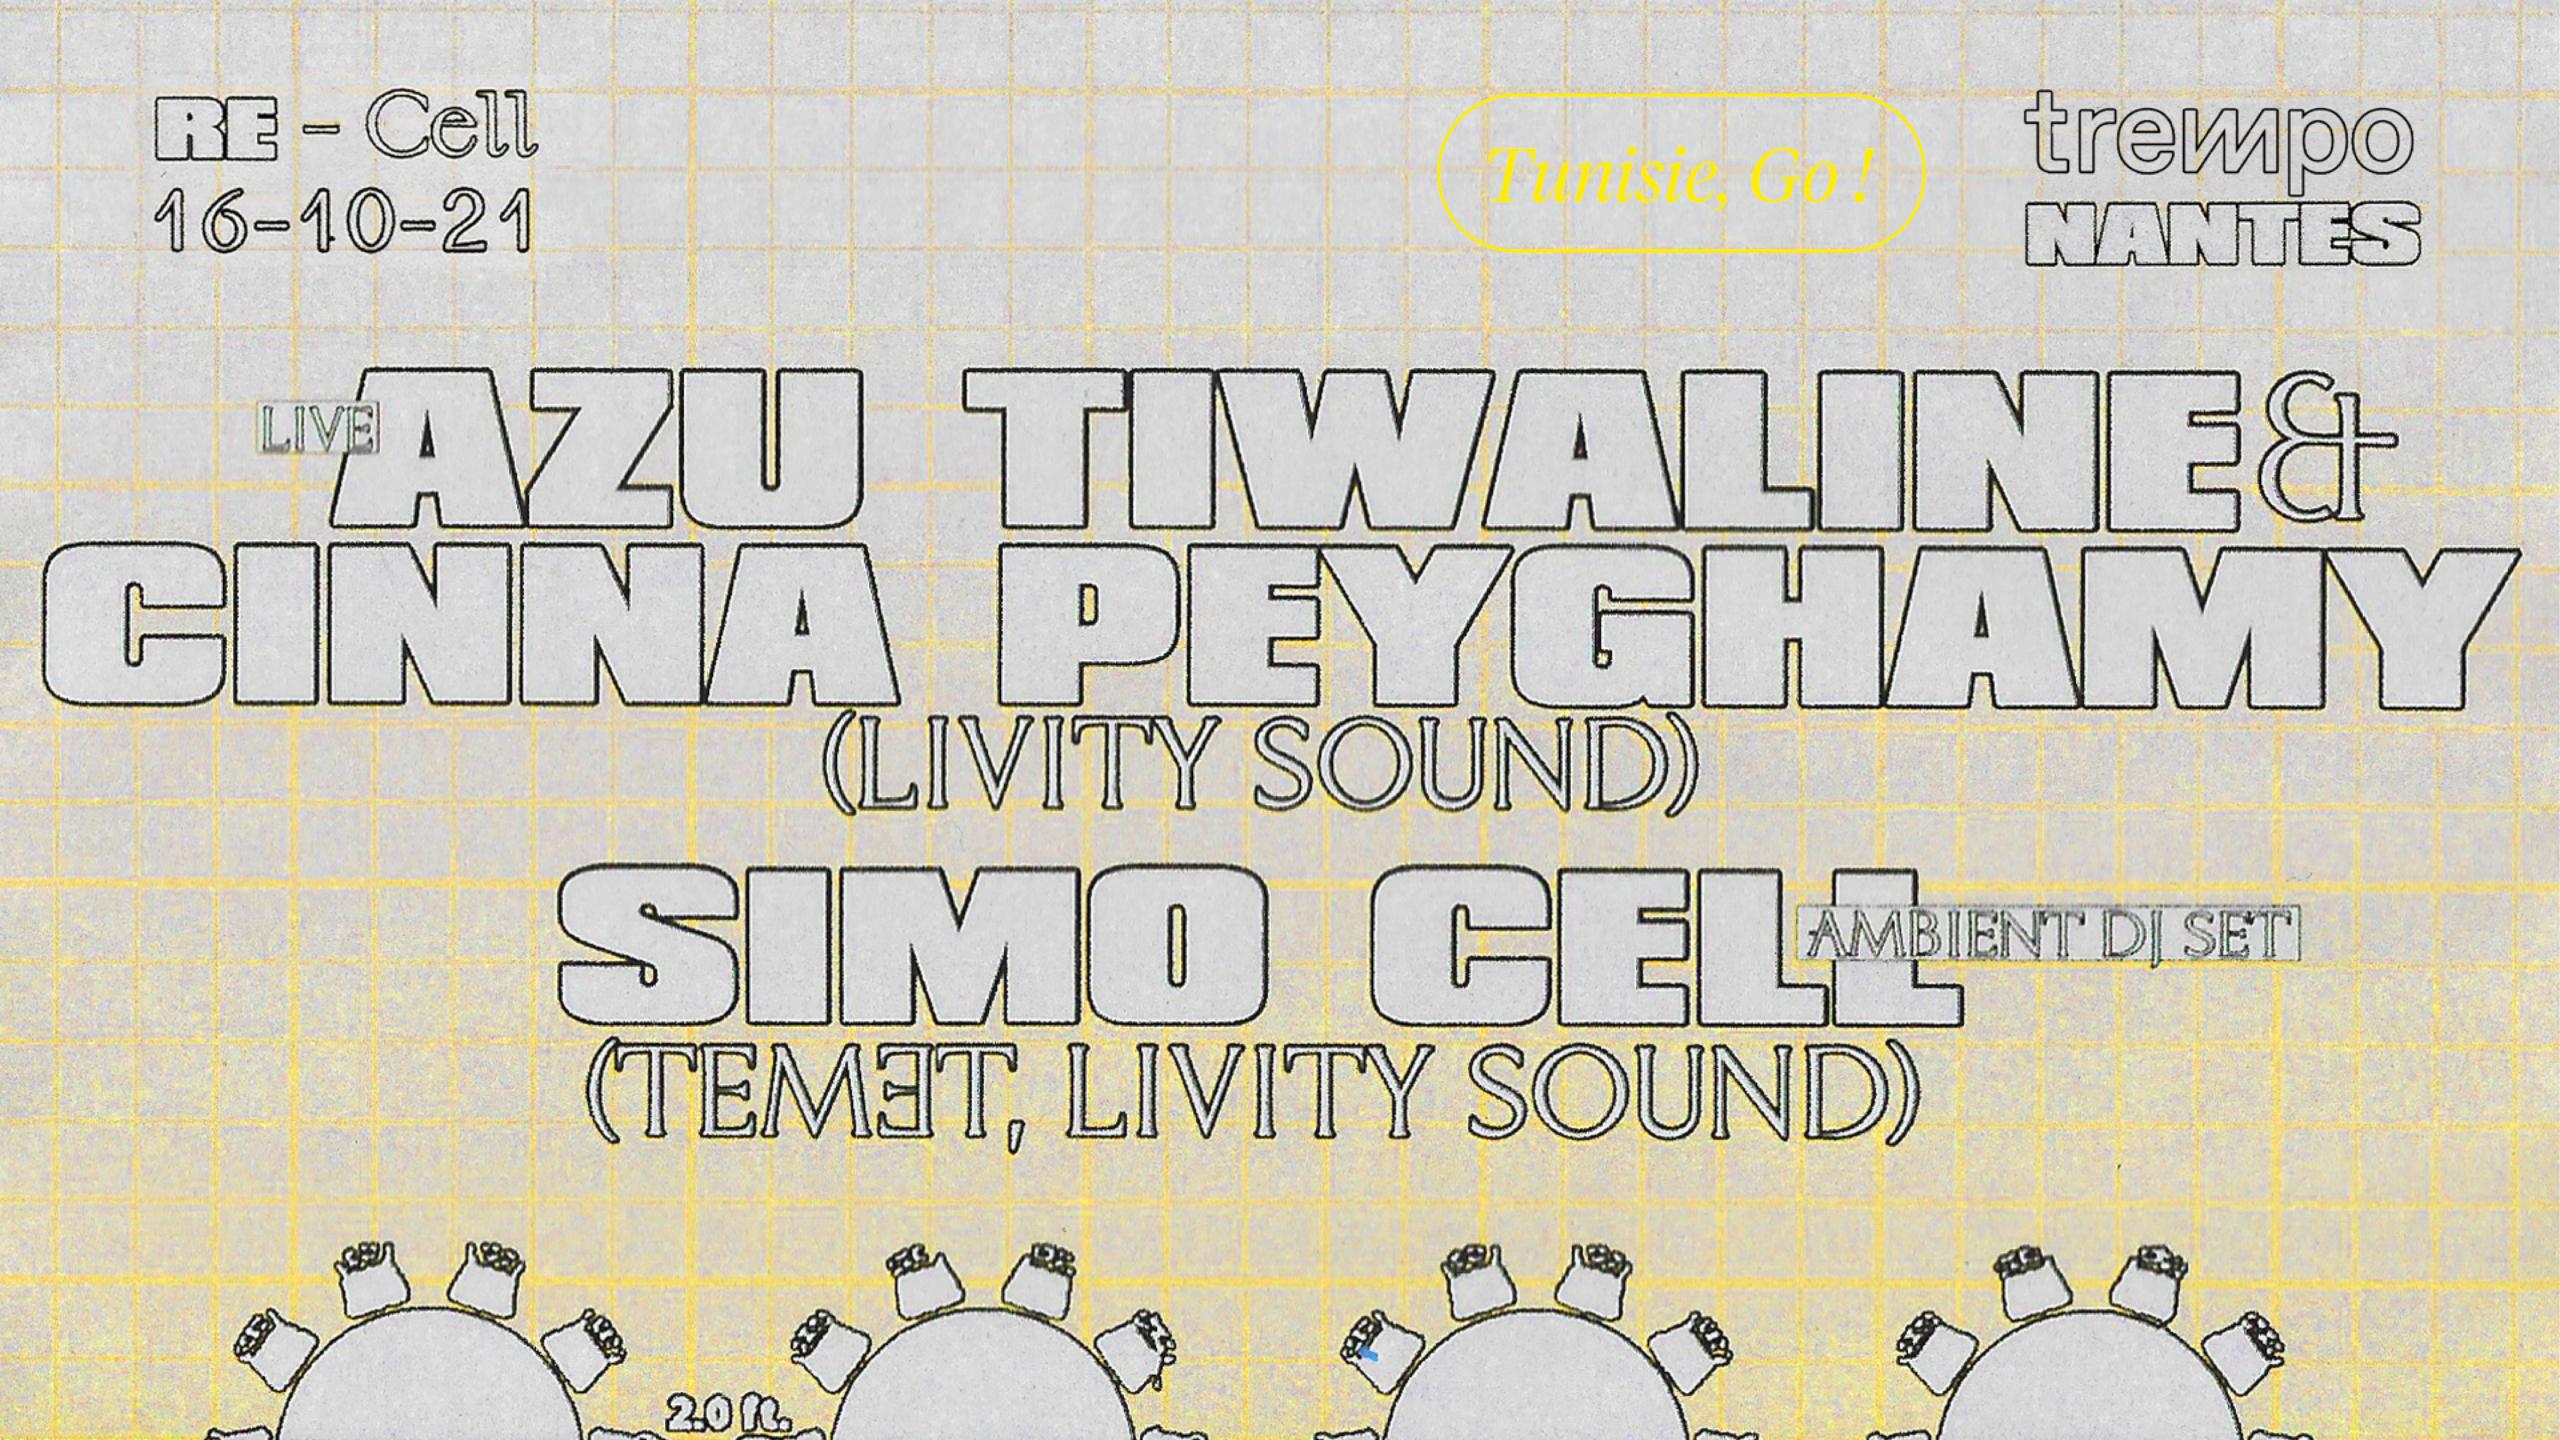 Tunisie, Go !  RE-Cell : Azu Tiwaline & Cinna Peyghamy + Simo Cell